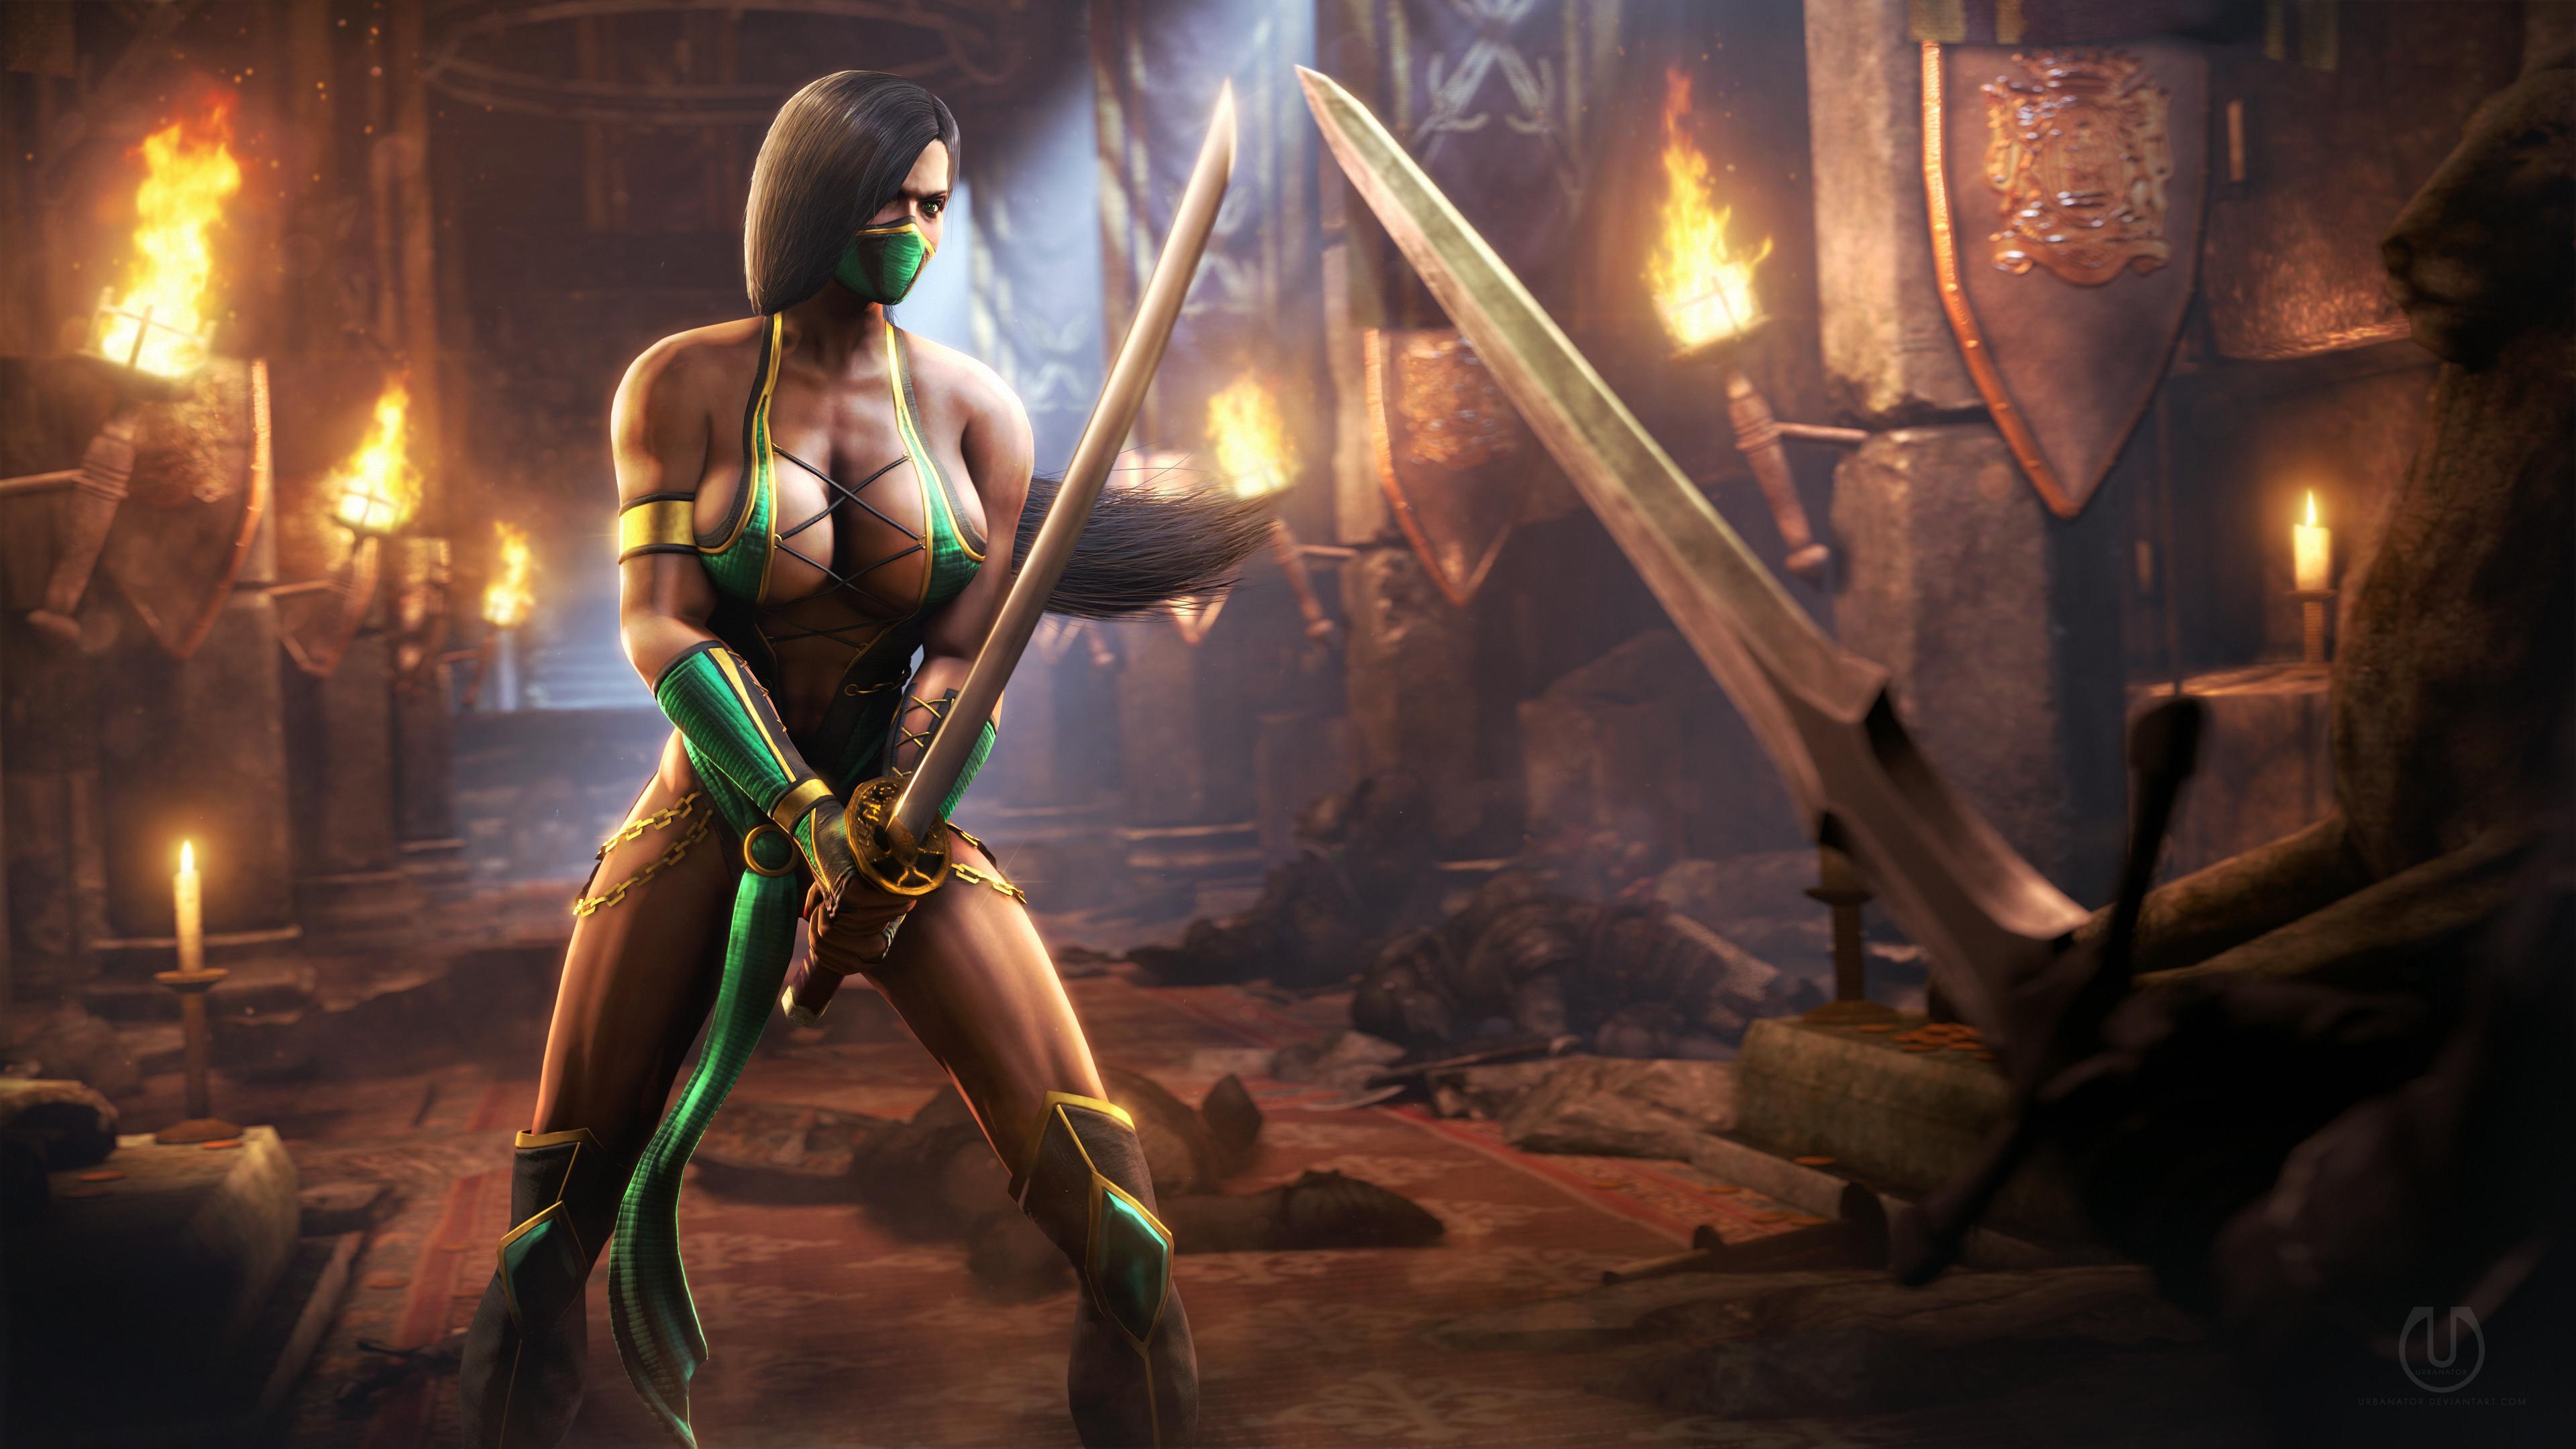 Mortal kombat 9 jade naiked pron image